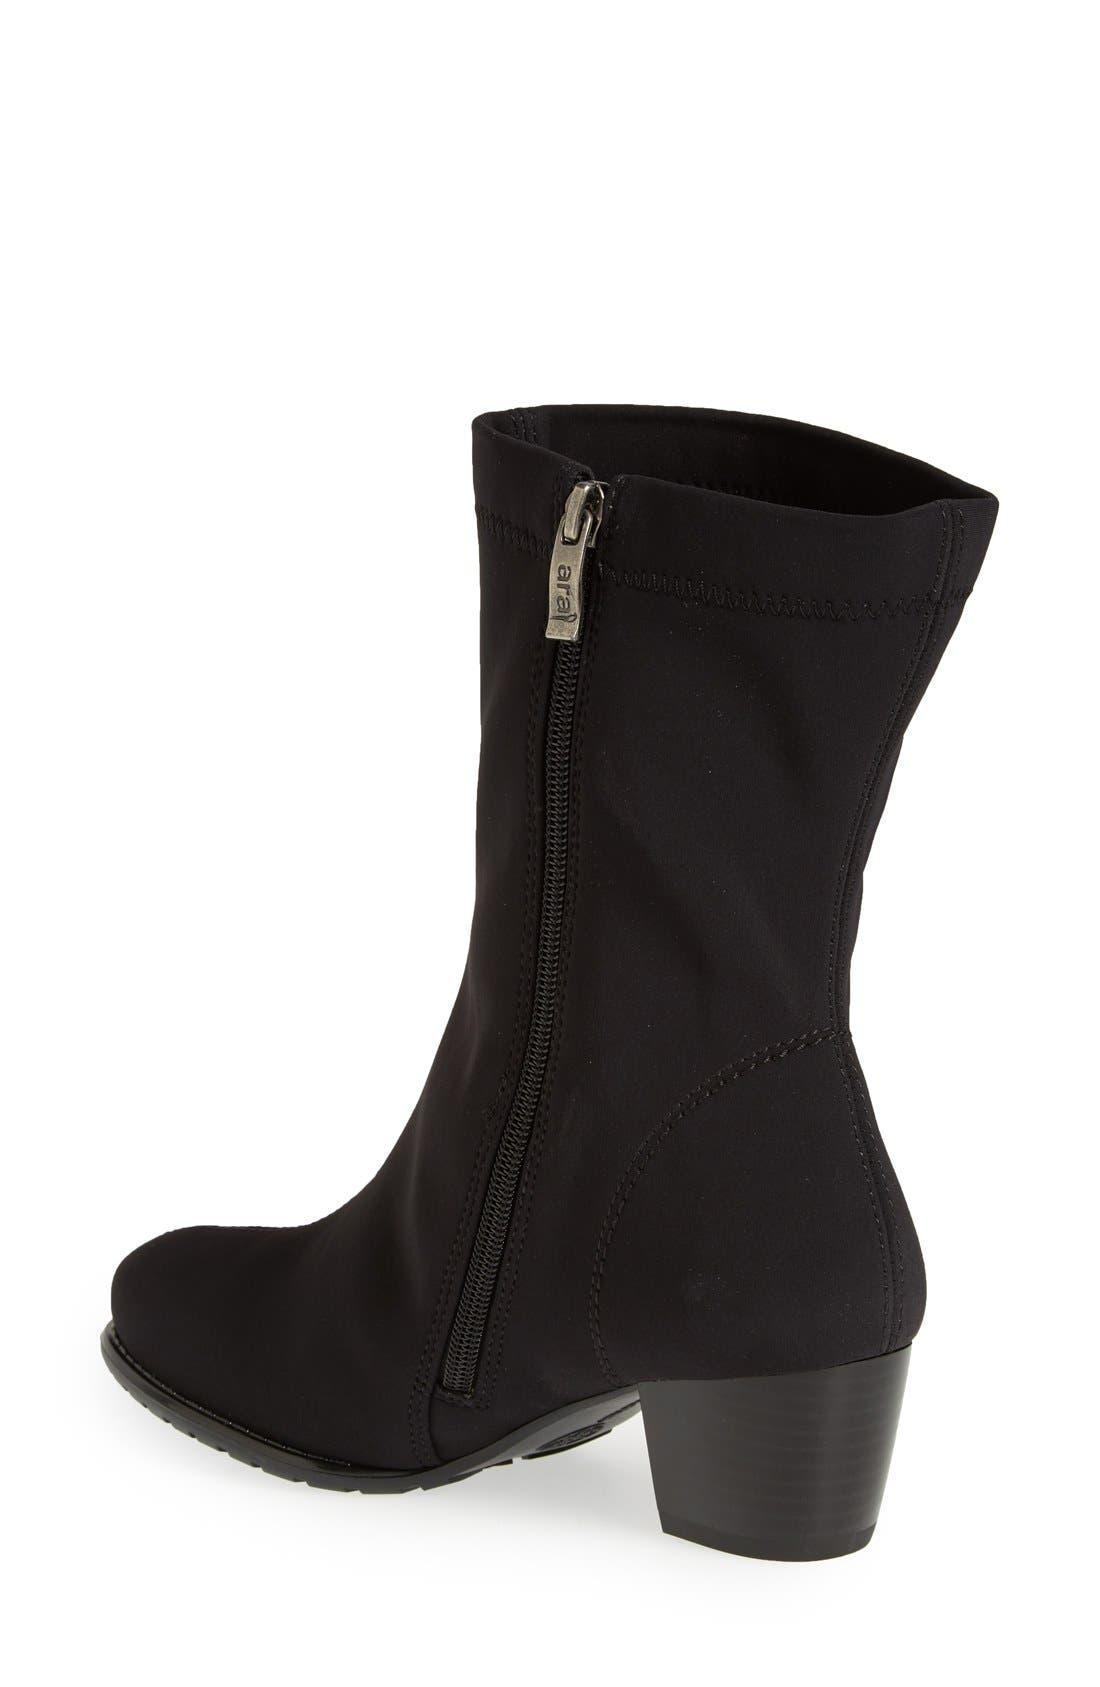 Alternate Image 2  - ara 'Fairfax' Waterproof Gore-Tex® Block Heel Boot (Women)